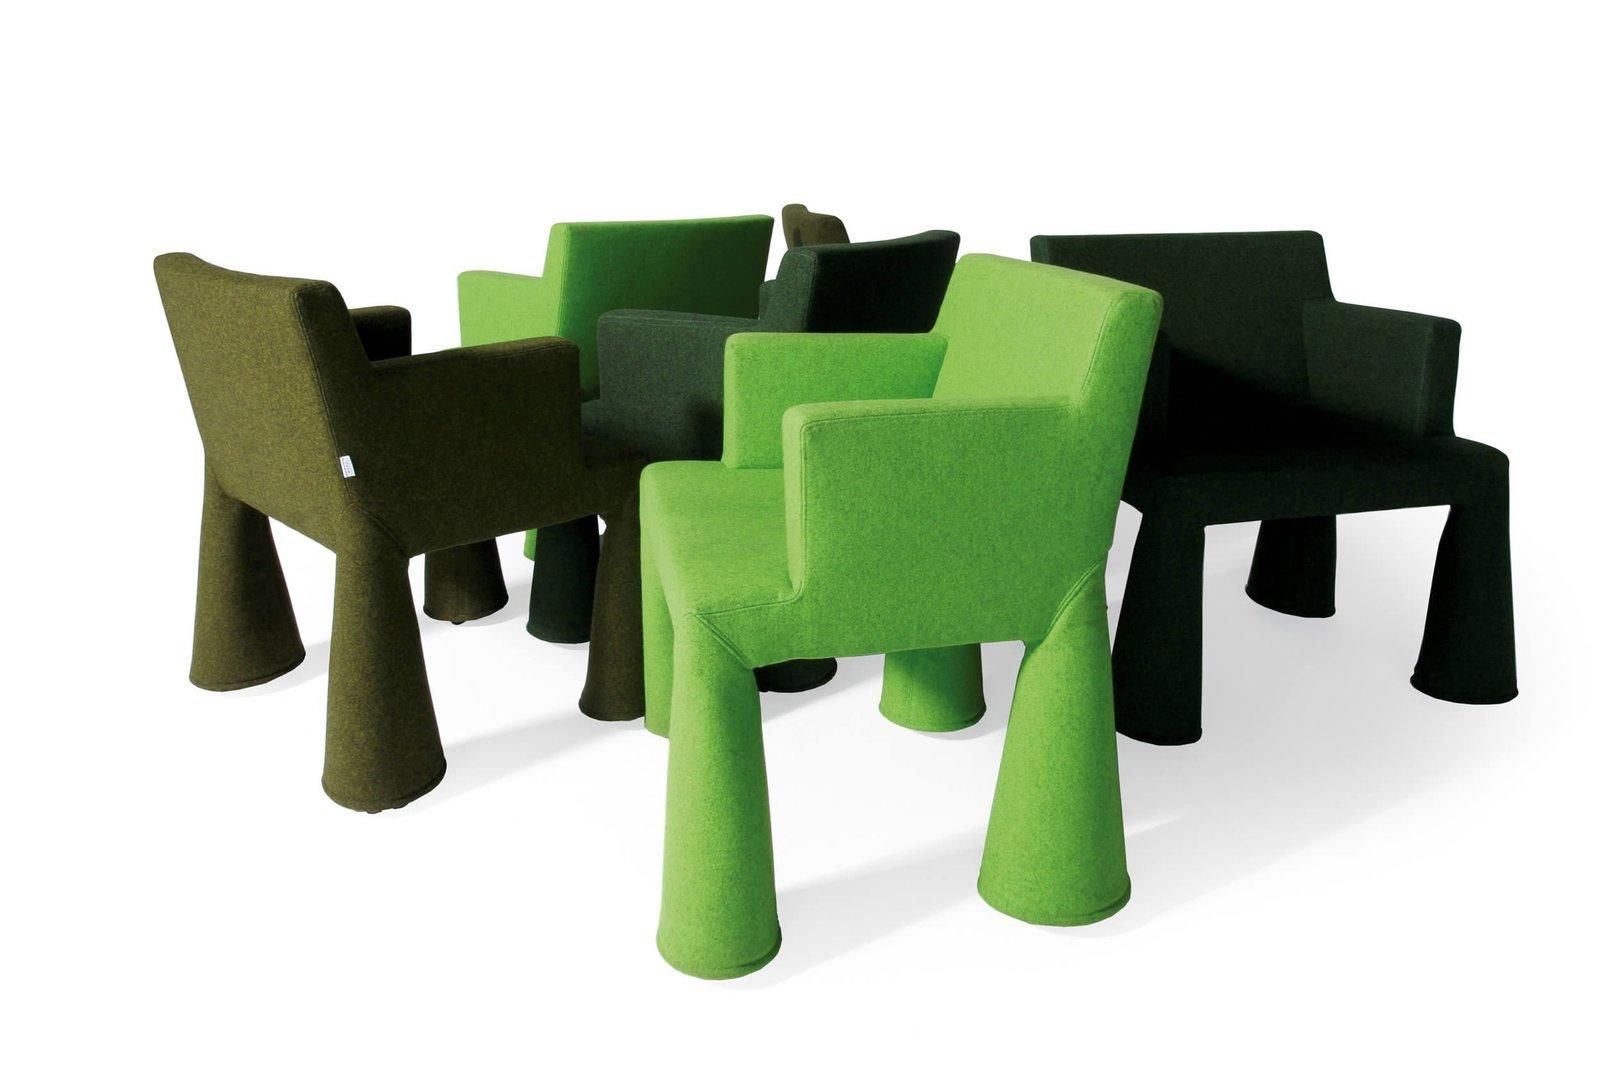 "V.I.P. Chair by Marcel Wanders  ∙ moooi  Search ""동해출장마사지-출장안마-출장-출장서비스 동해콜걸 출장샵 주소ㅋr톡BC388 주소[sannhu222,vip] 동해 출장여대생 만남 출장만남 업소 타이마사지 출장샵추천 업소  동해출장샵 출장서비스 출장업소"""